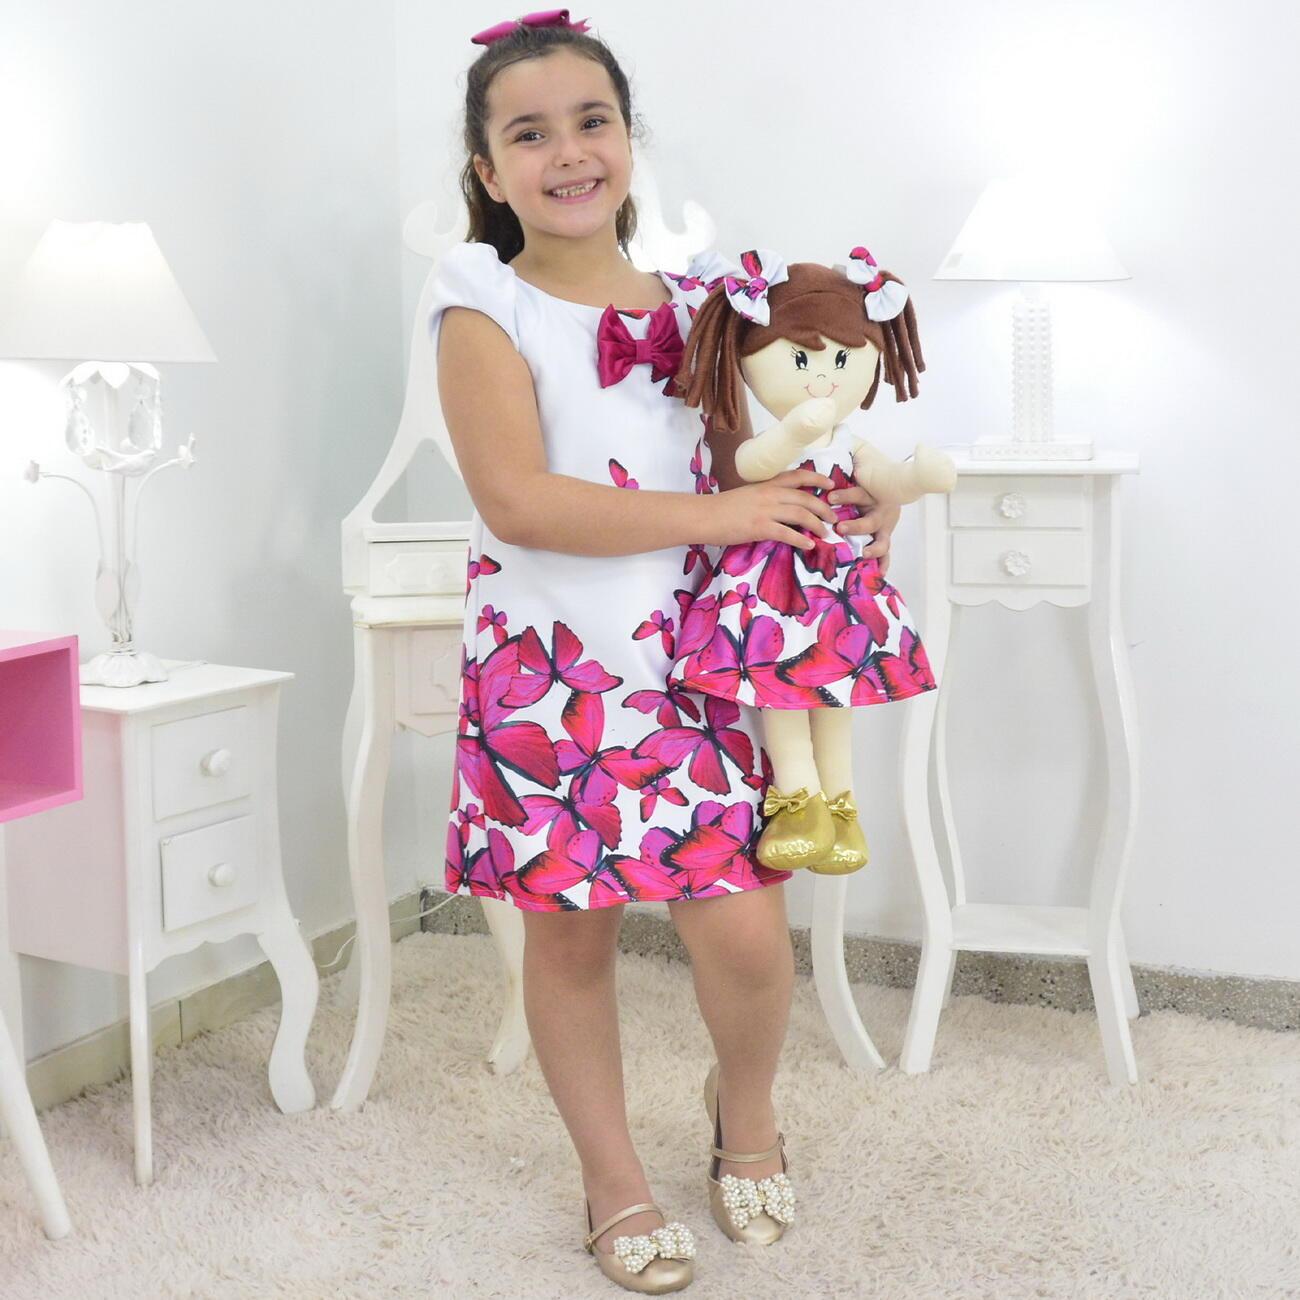 Tal Menina Tal Boneca Mari - Vestido Trapézio Com Borboletas Rosas